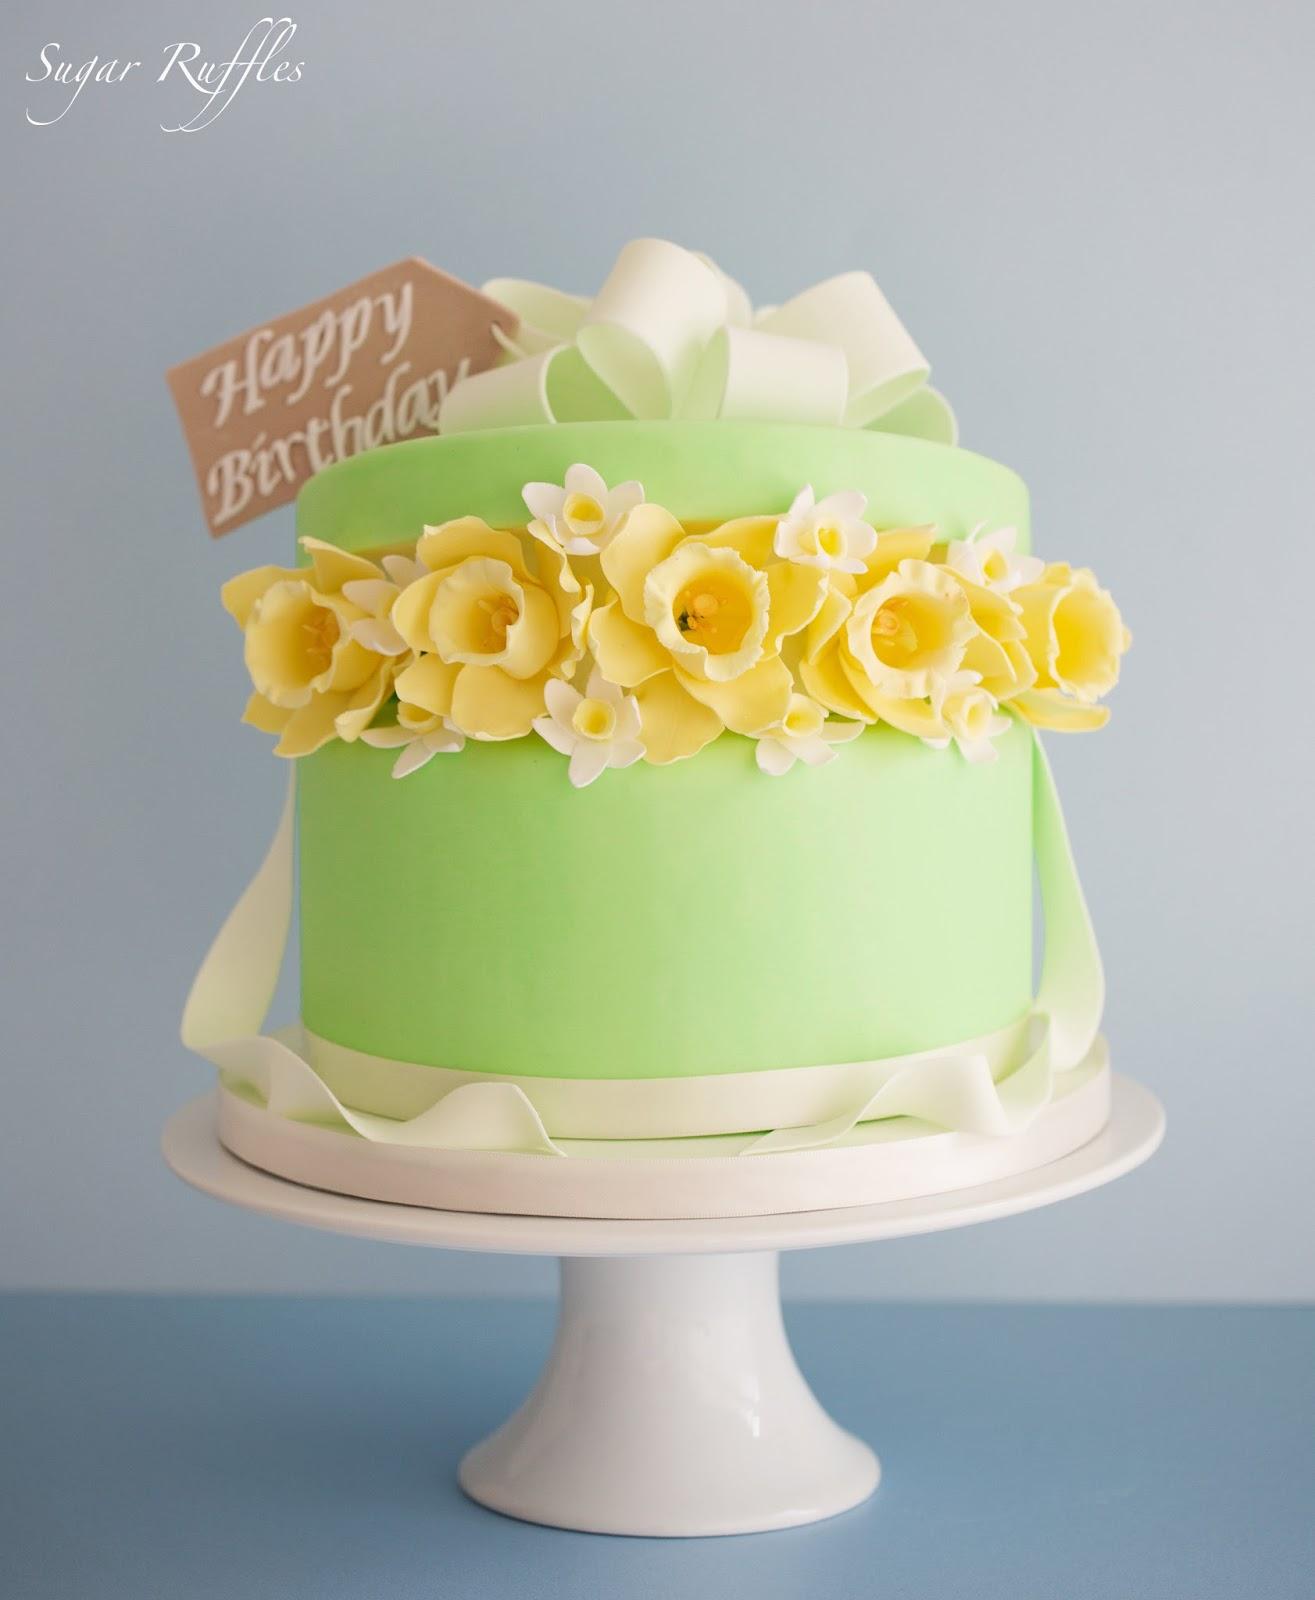 Party Cakes Magazine- Daffodil Birthday Cake